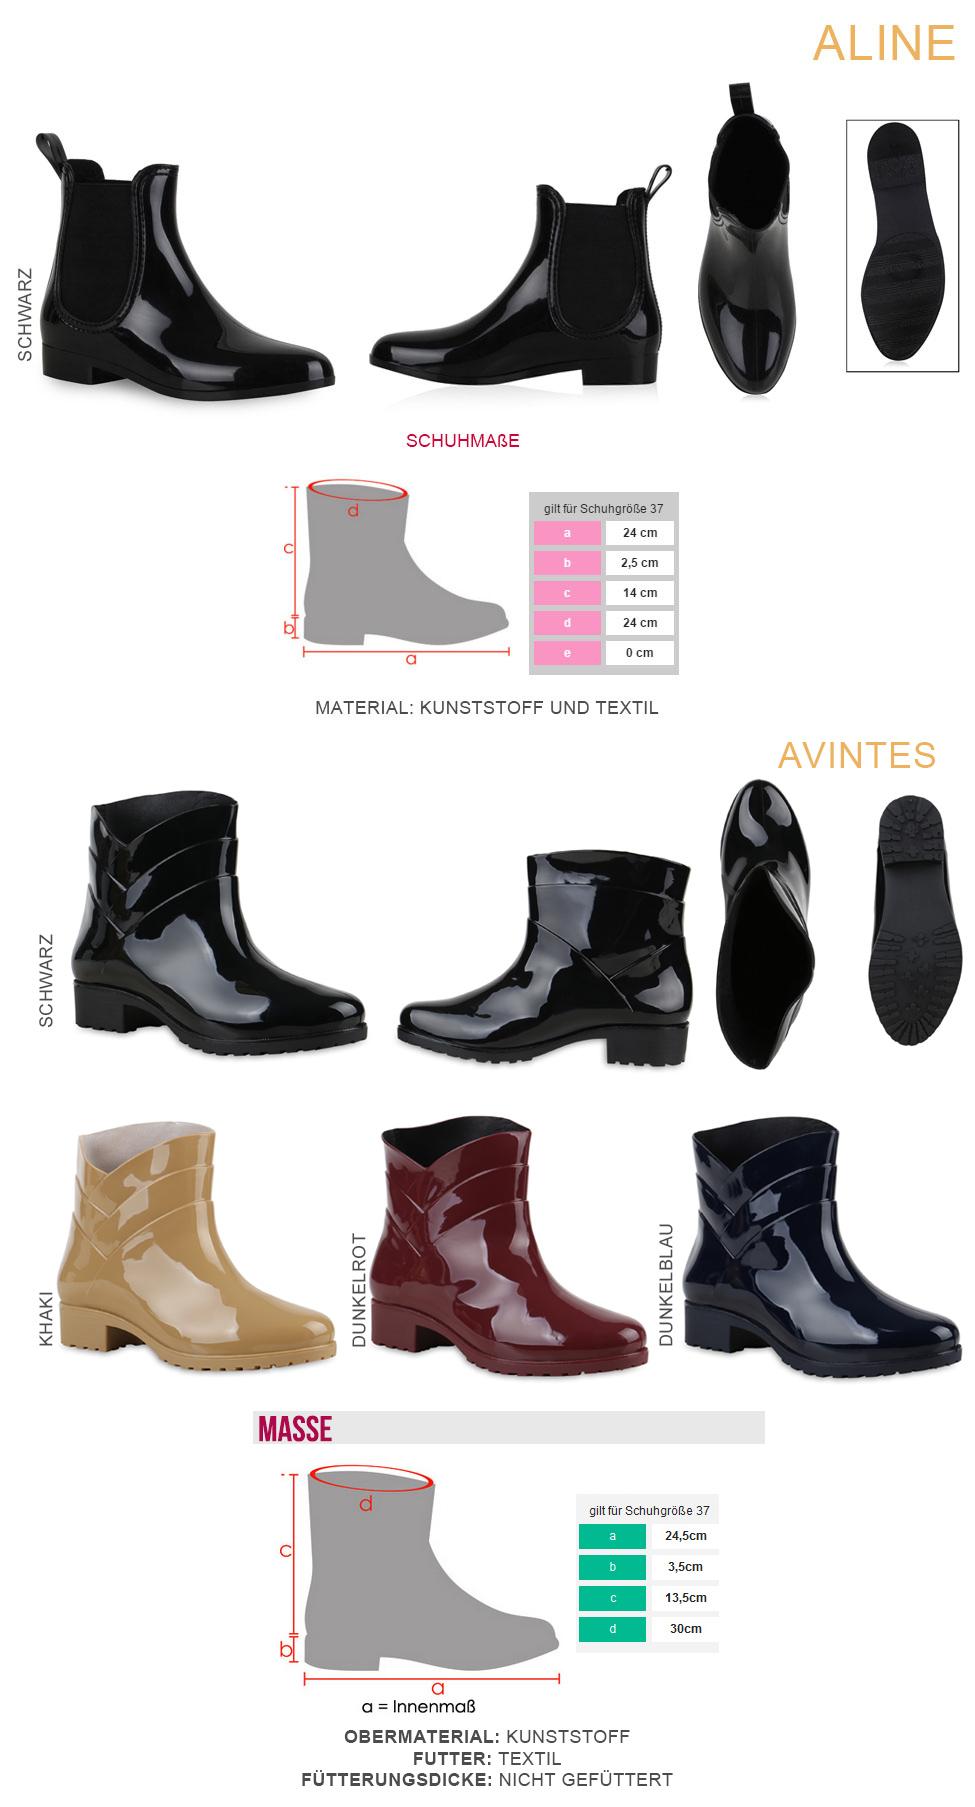 Details about Womens Patent Ankle Boots Rubber Boots Chelsea Boots Shoes 70510 Size 36 41 show original title